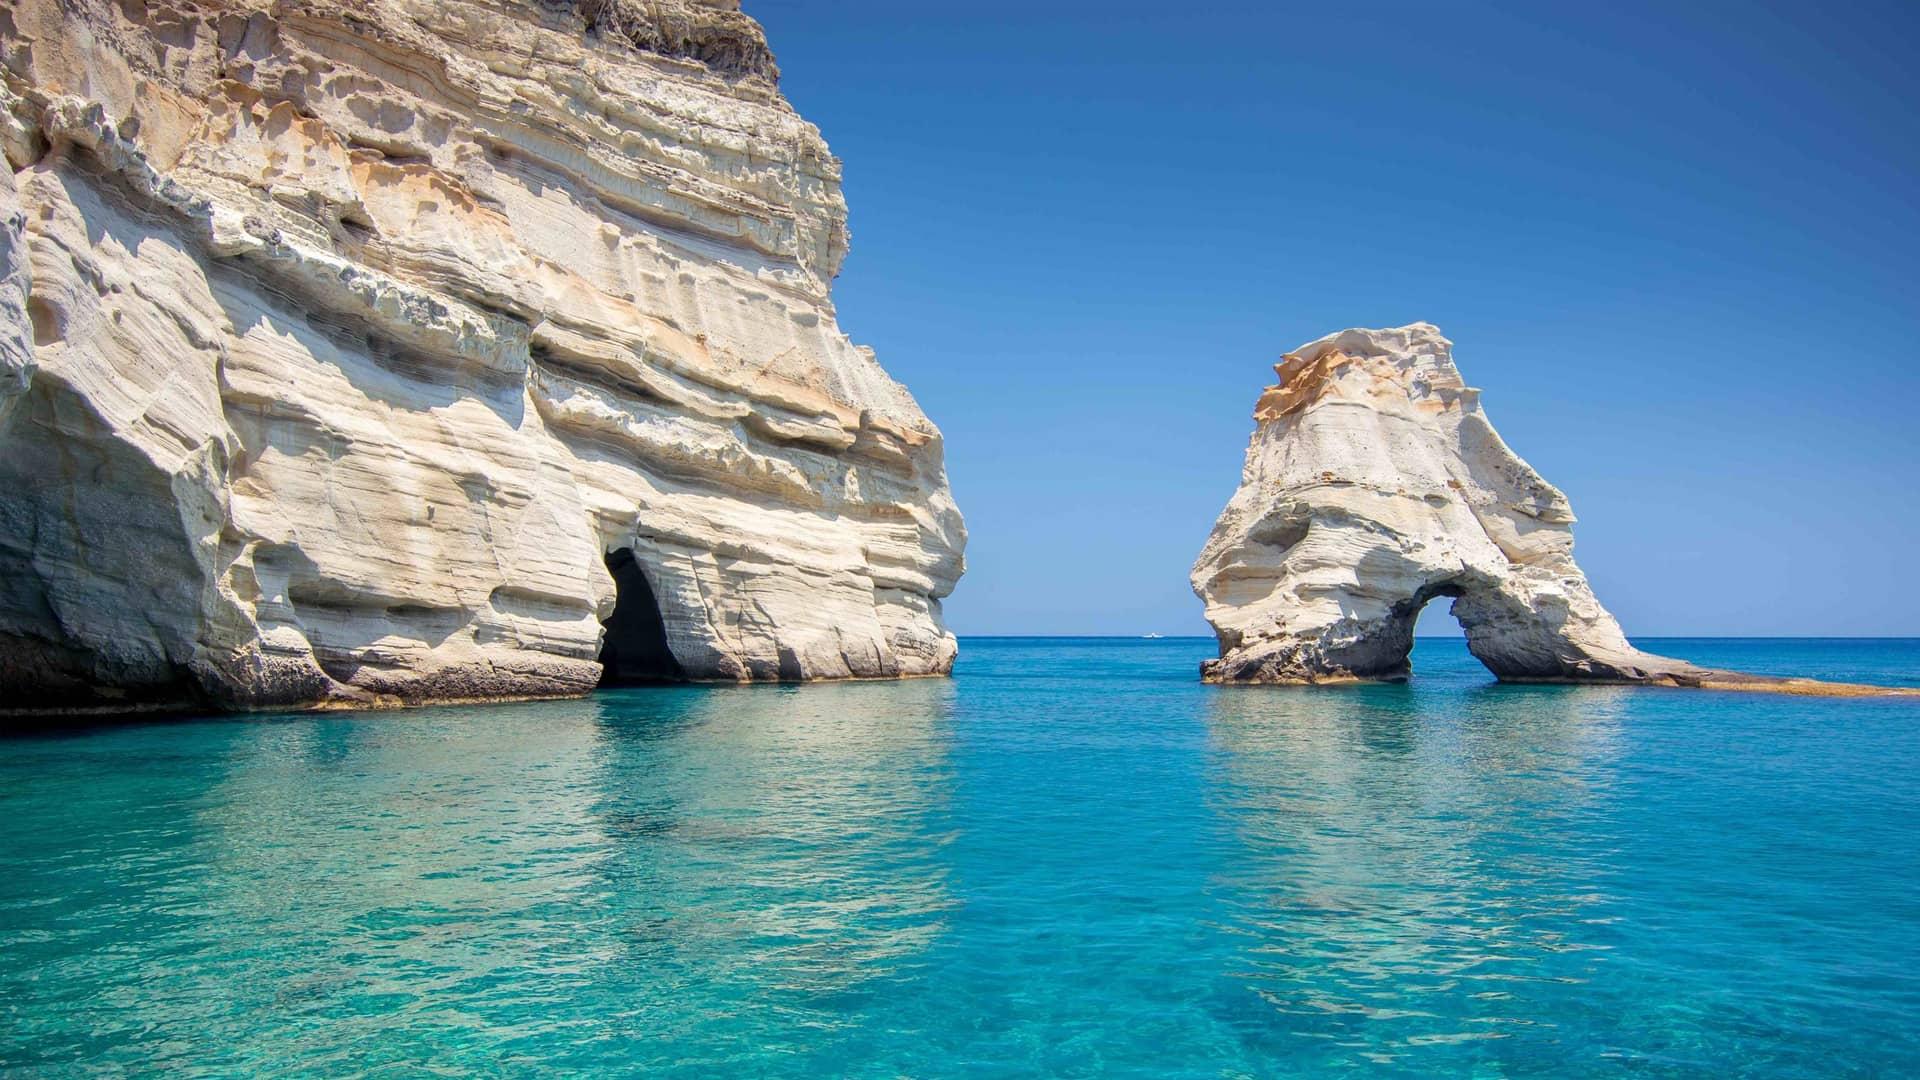 Typical Kaolin-rich rock formation in Milos